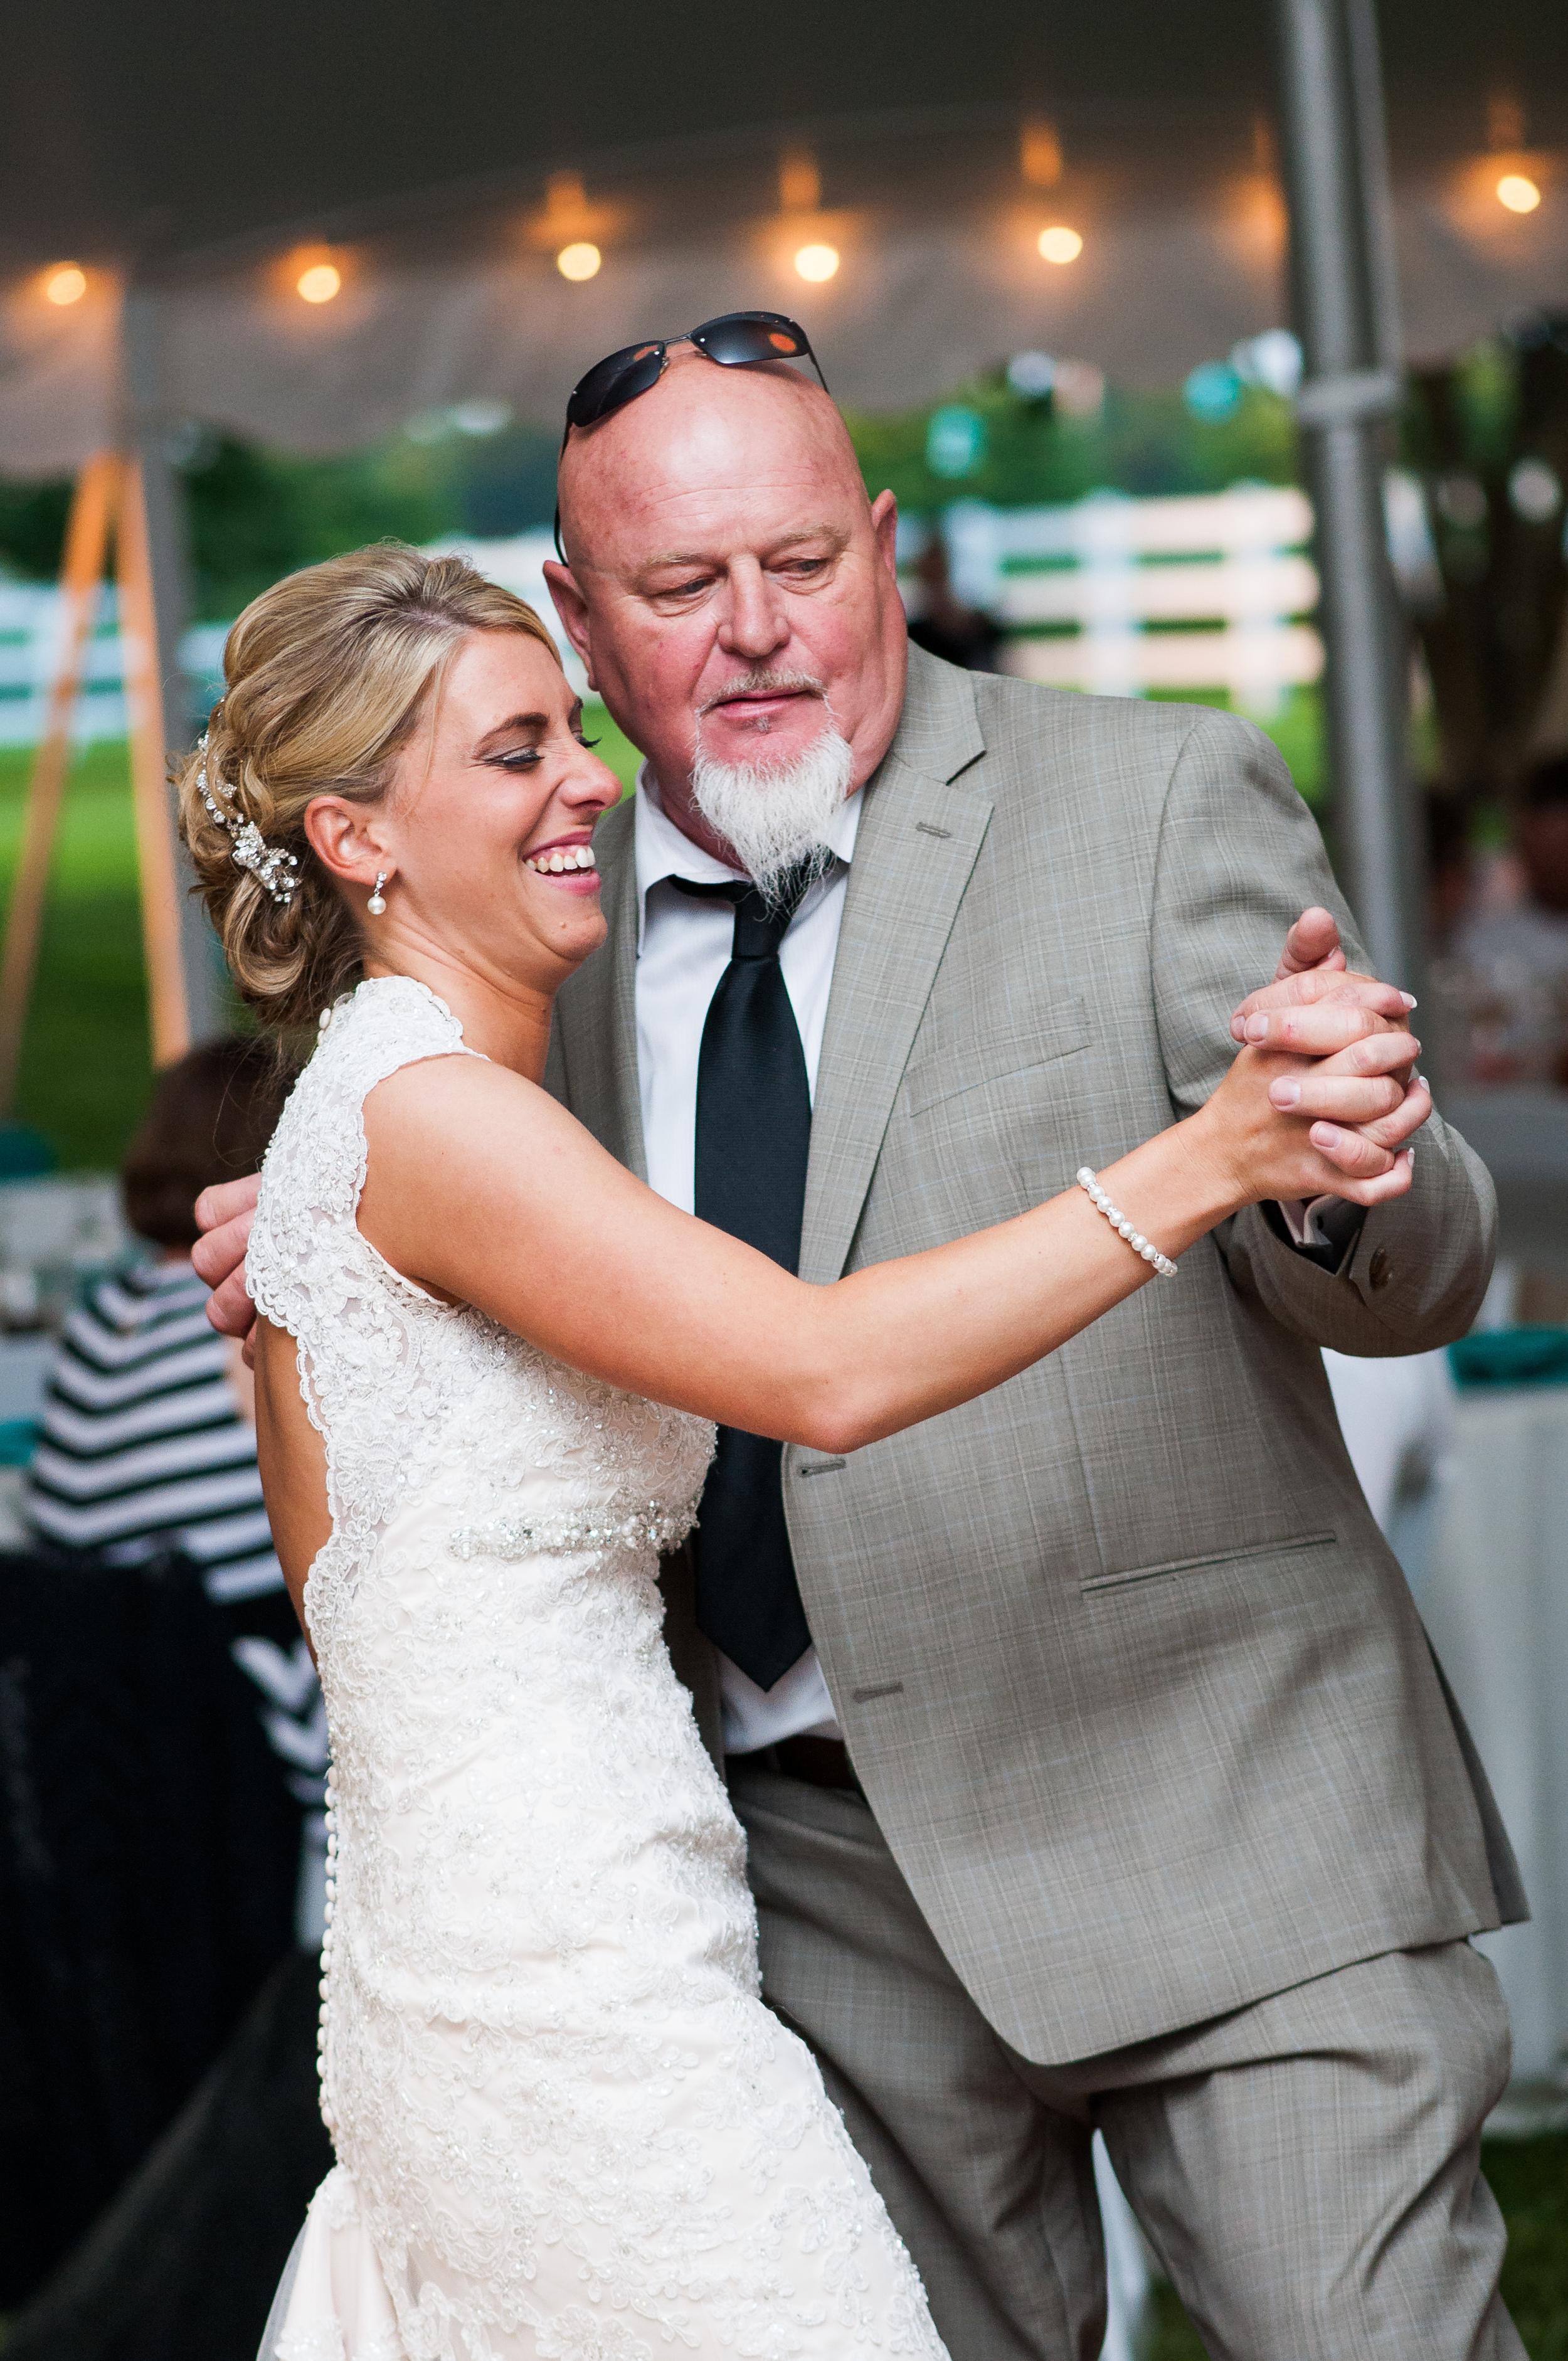 140614 - Julie and Hunter's Wedding-284.jpg